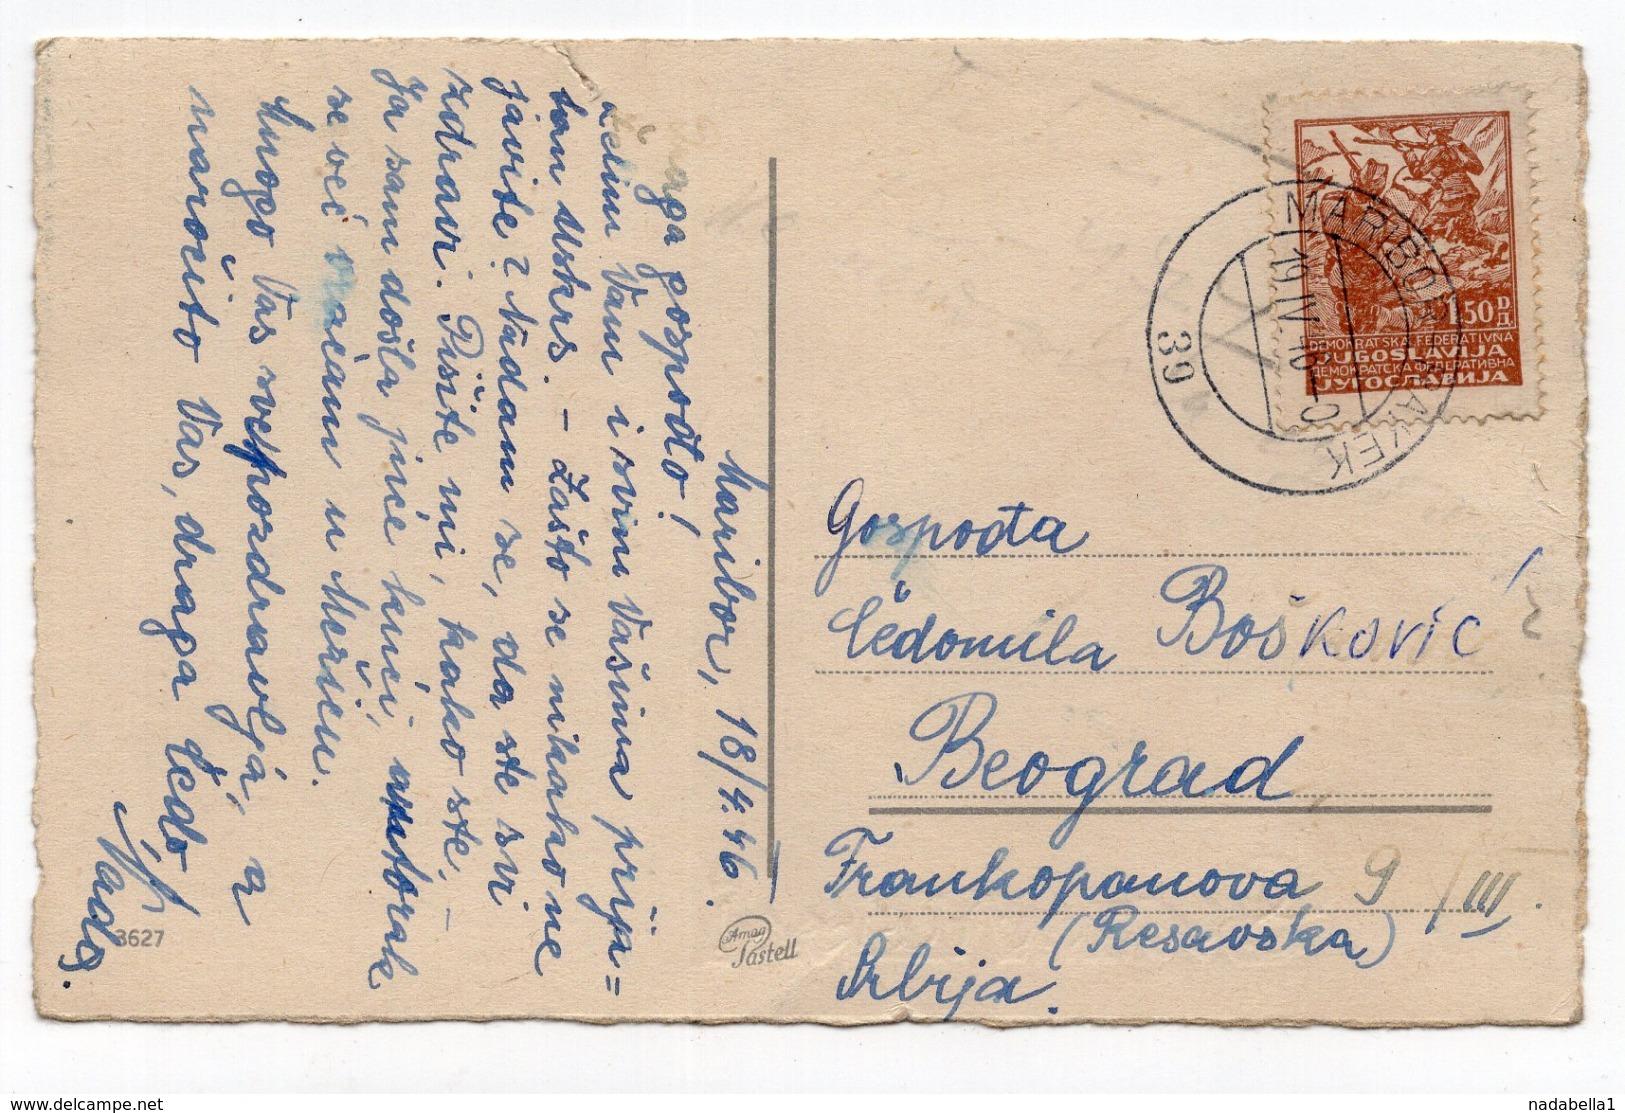 1946 YUGOSLAVIA, SLOVENIA, EASTER CARD, TPO 39  MARIBOR - RAKEK, SENT TO BELGRADE, ILLUSTRATED POSTCARD, USED - Yugoslavia